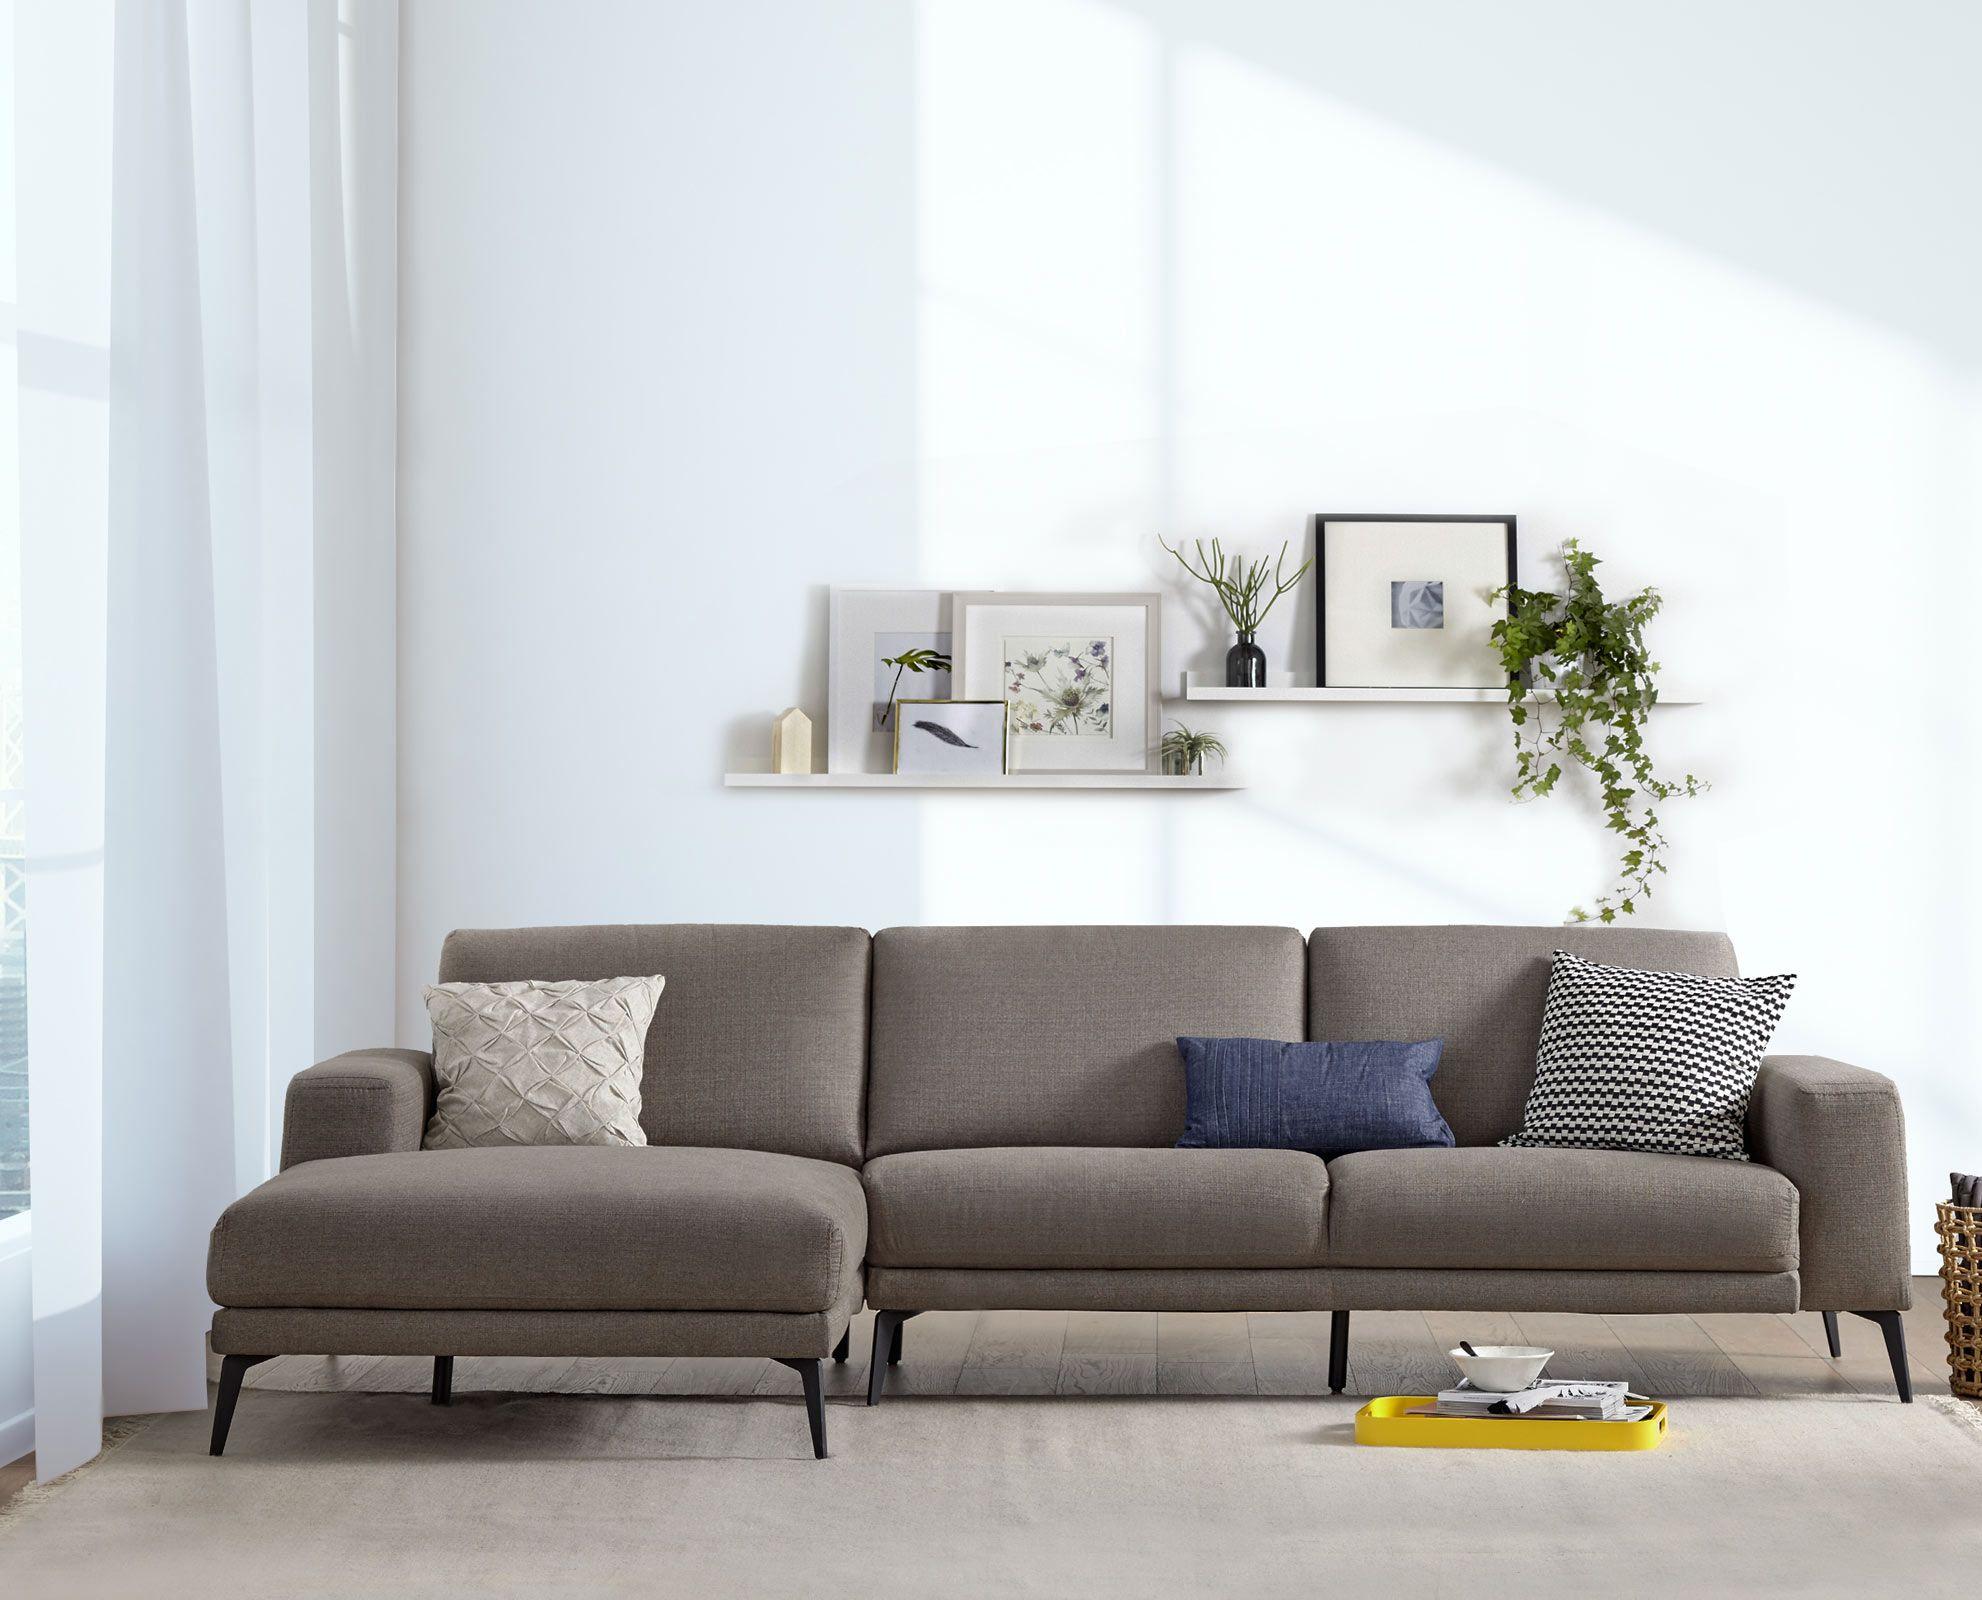 Dorete Left Chaise Sectional | Home decor | Pinterest | Contemporary ...